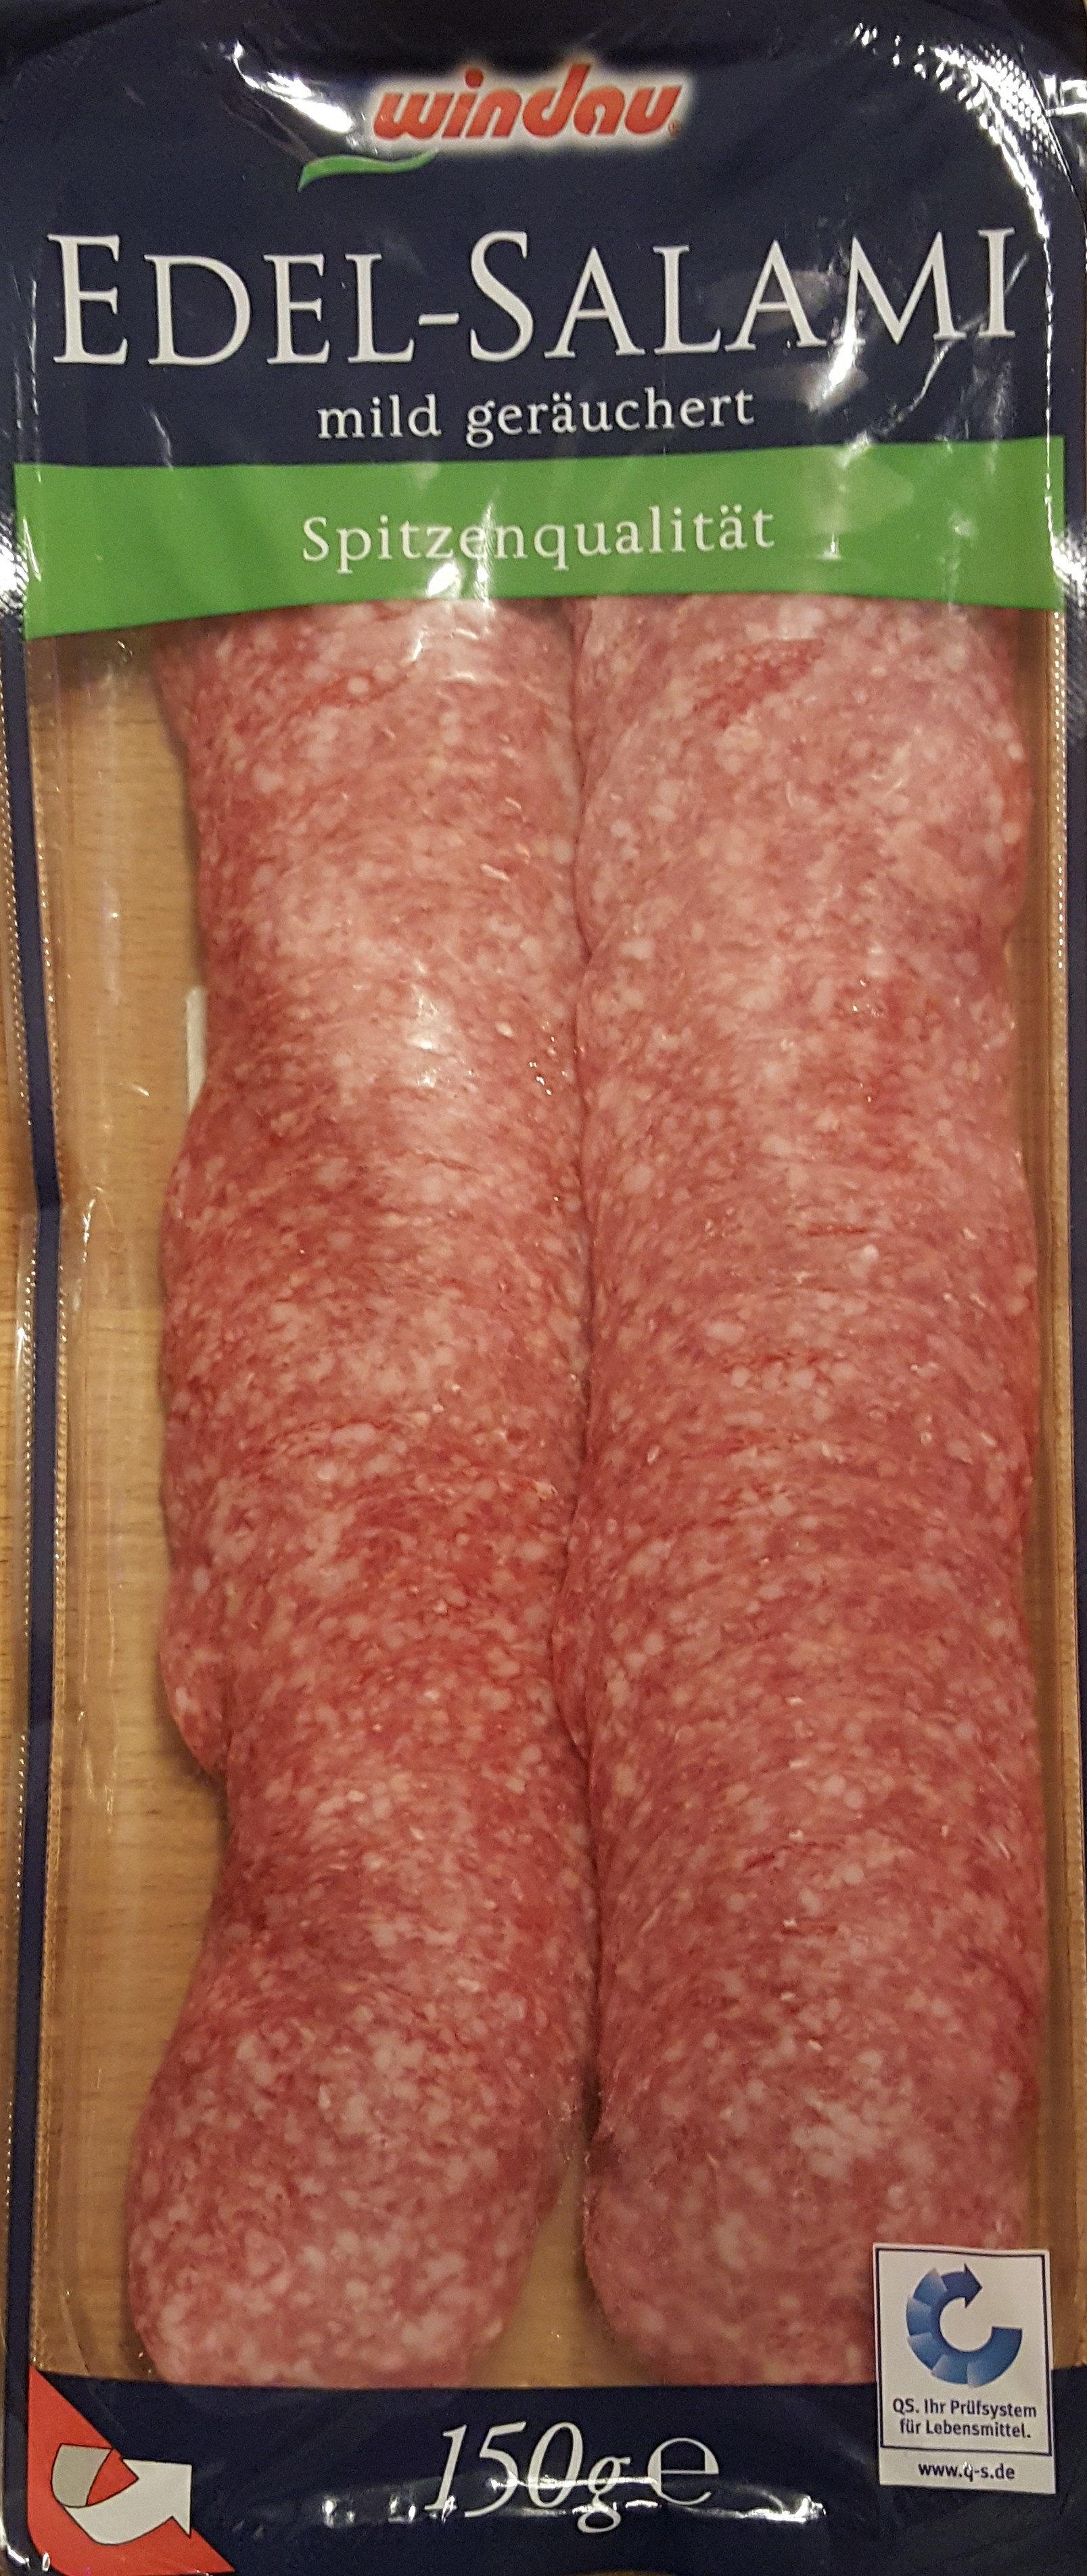 Edel-Salami mild geräuchert - Product